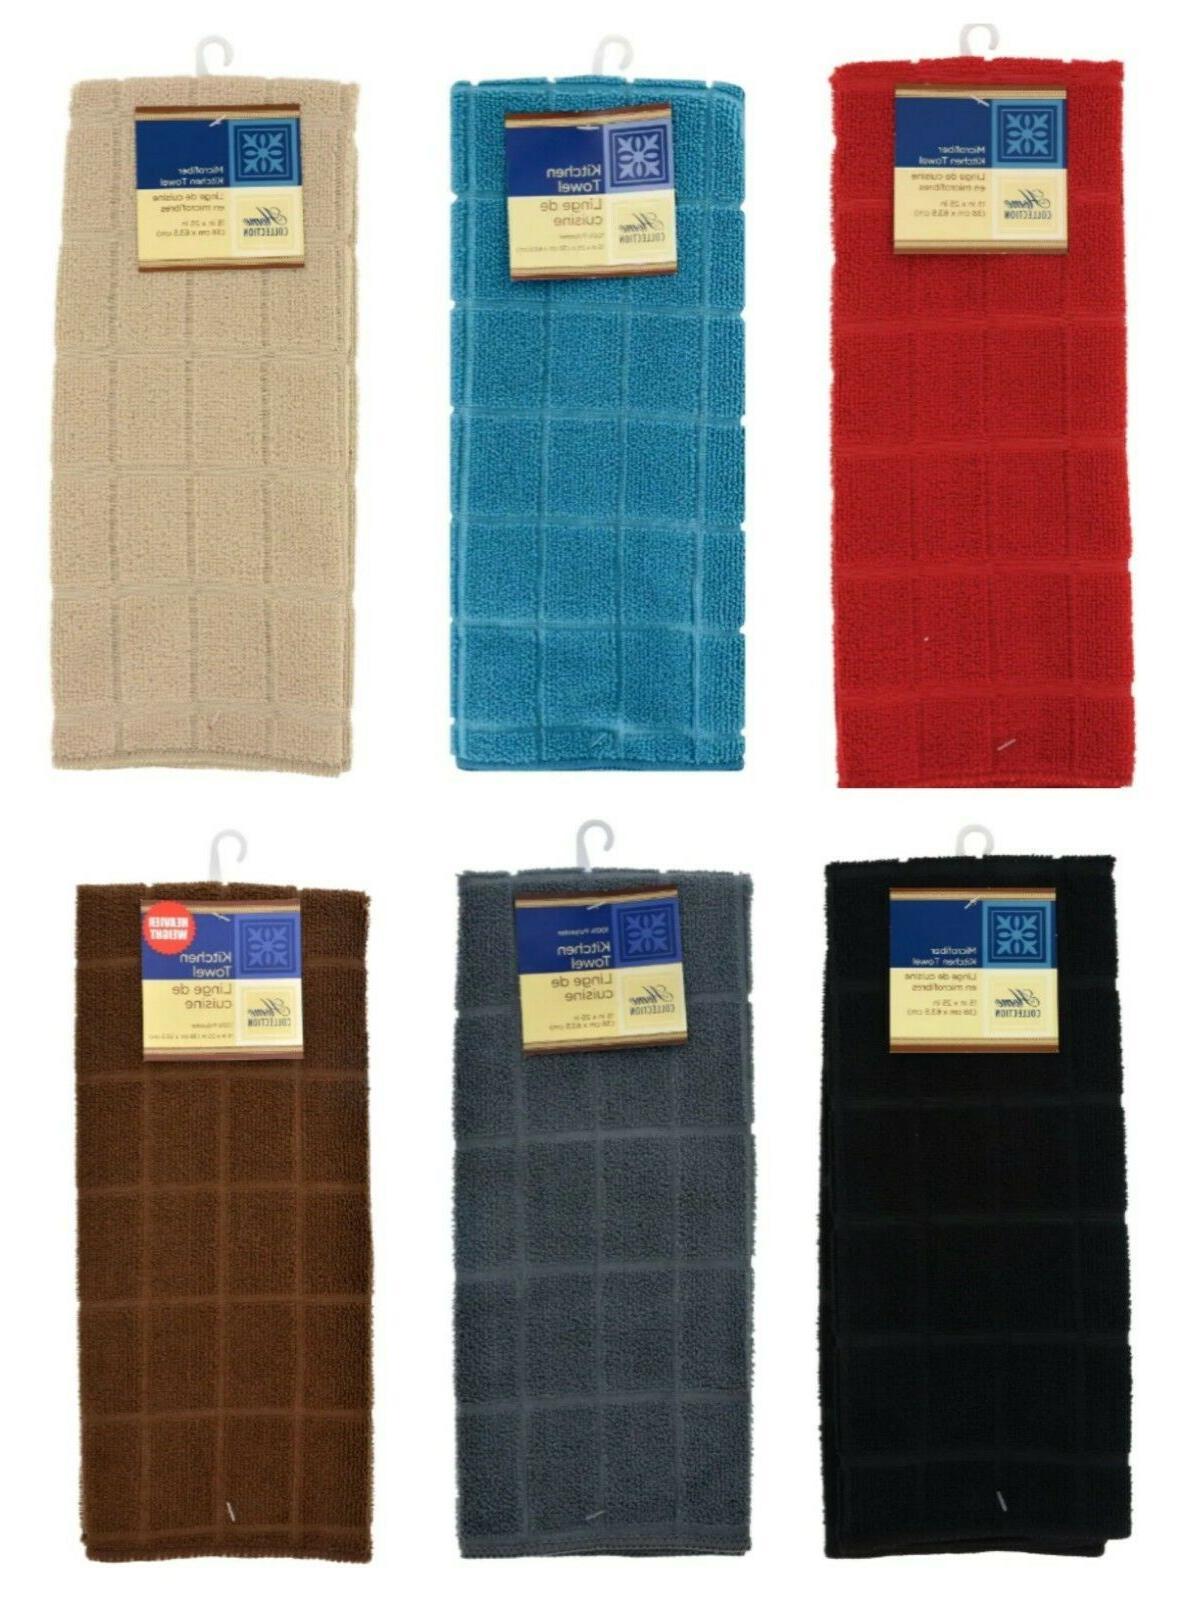 windowpane pattern kitchen towels 15x25 in variety